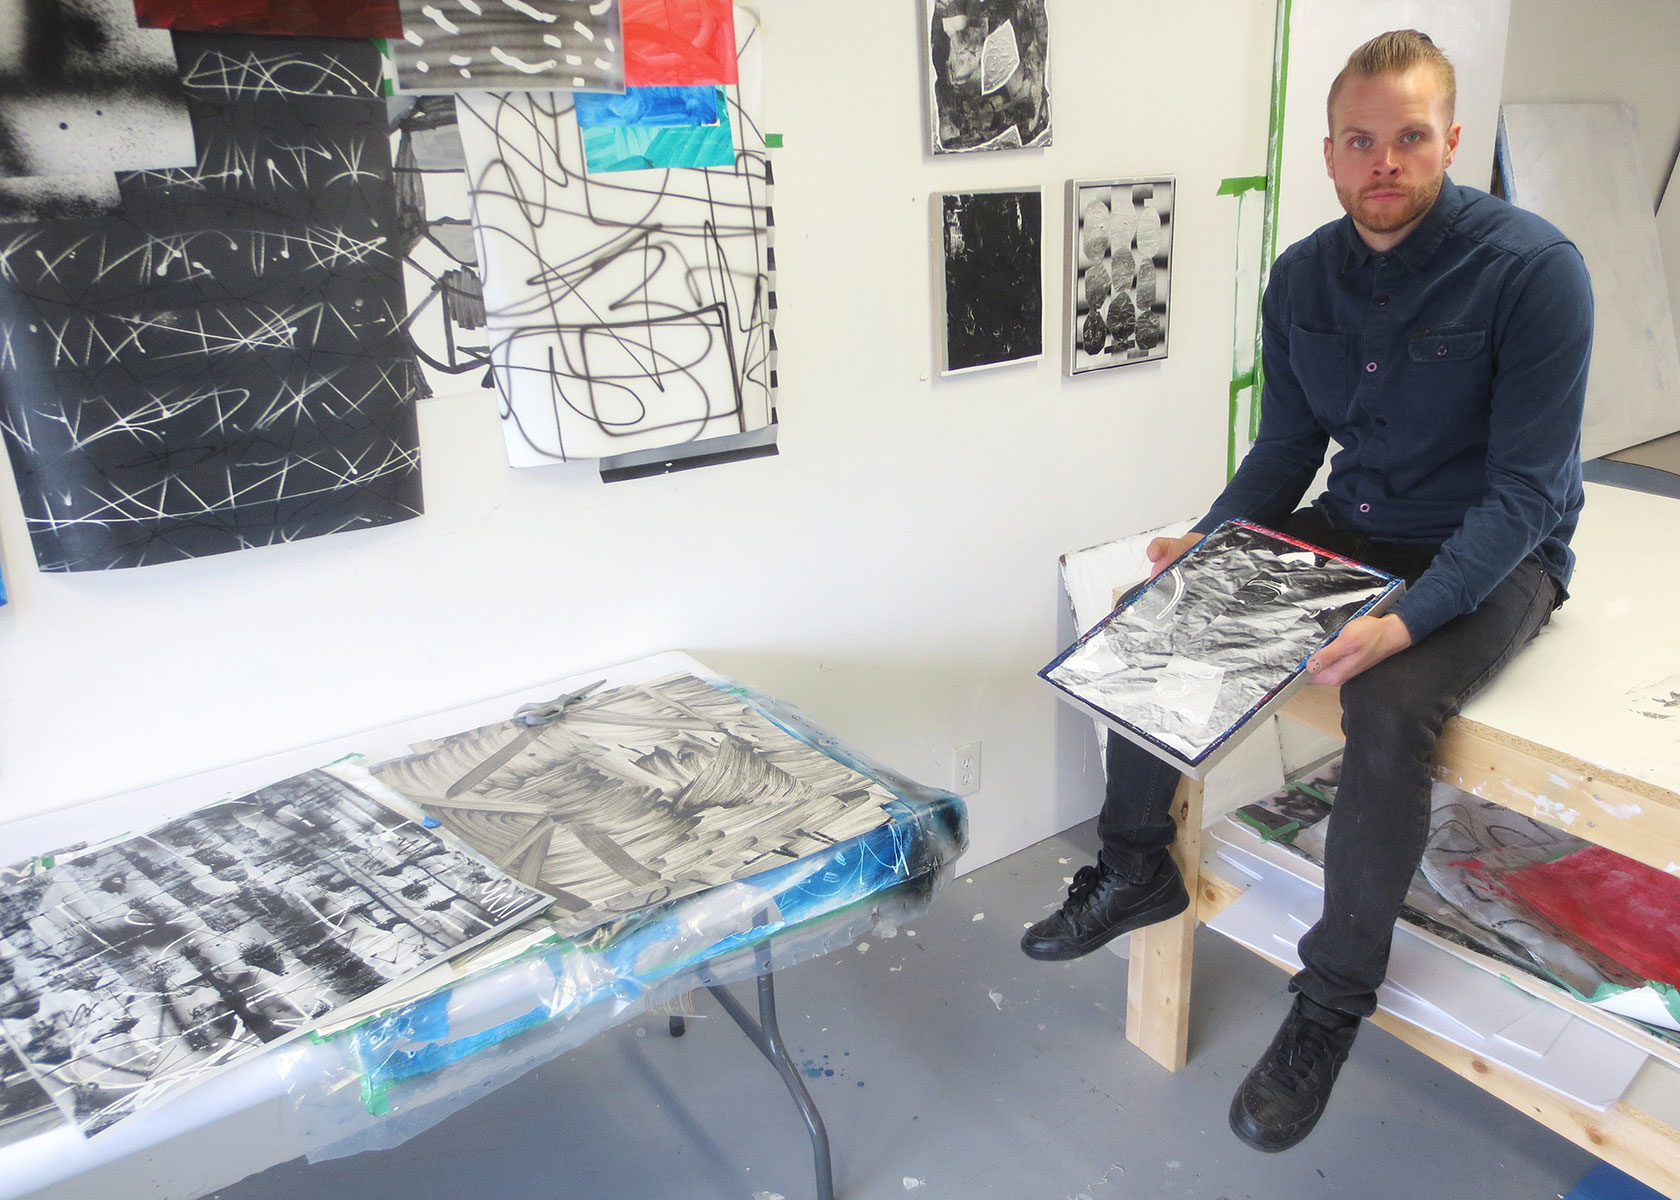 Jason Deary in his West End studio, Toronto, November 2015. Photos by Bill Clarke.